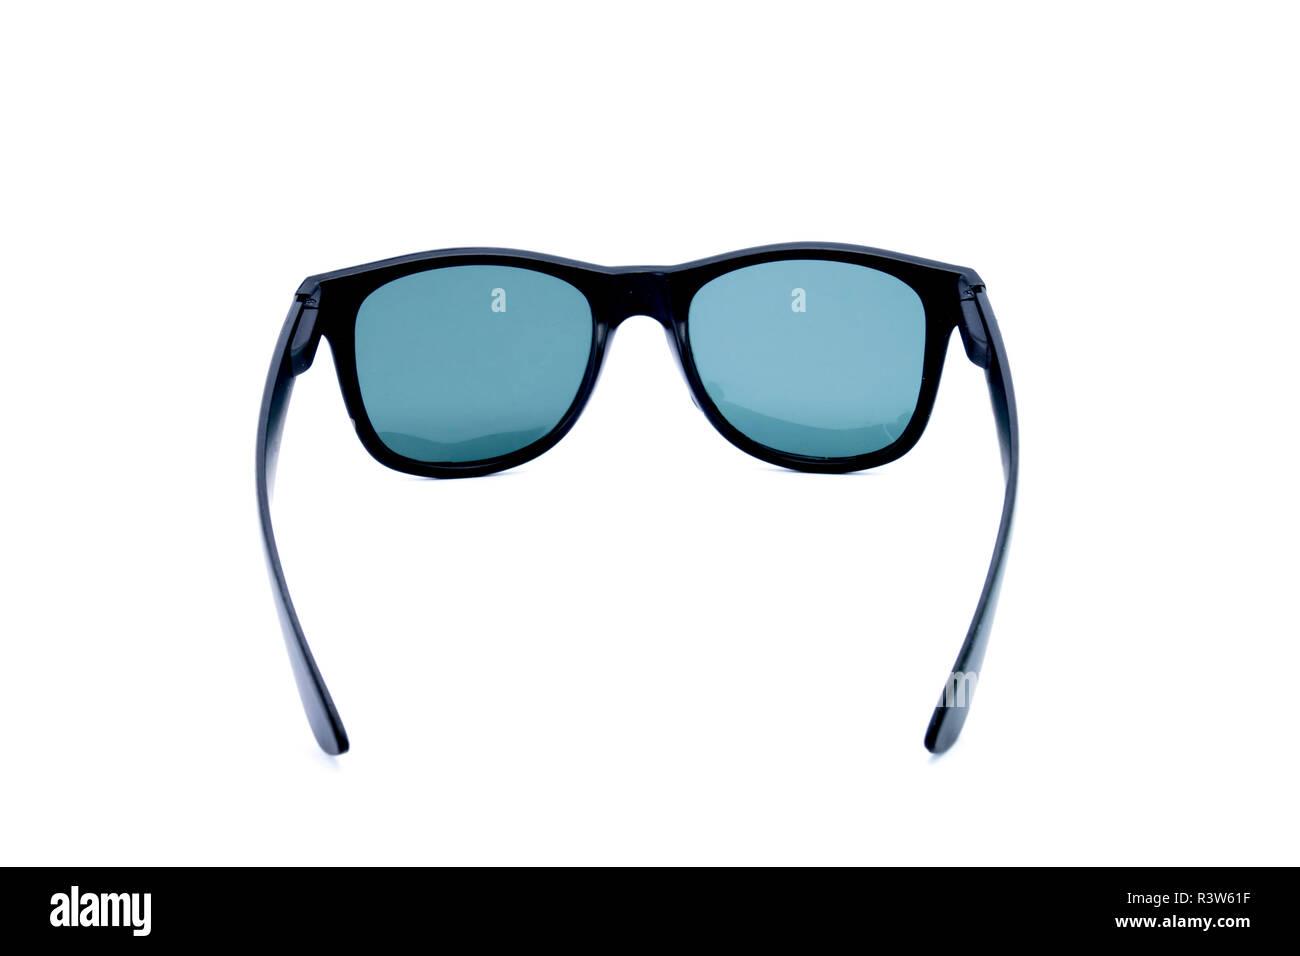 bede3838a83c Black glasses to improve eyesight isolated on white background - Stock Image